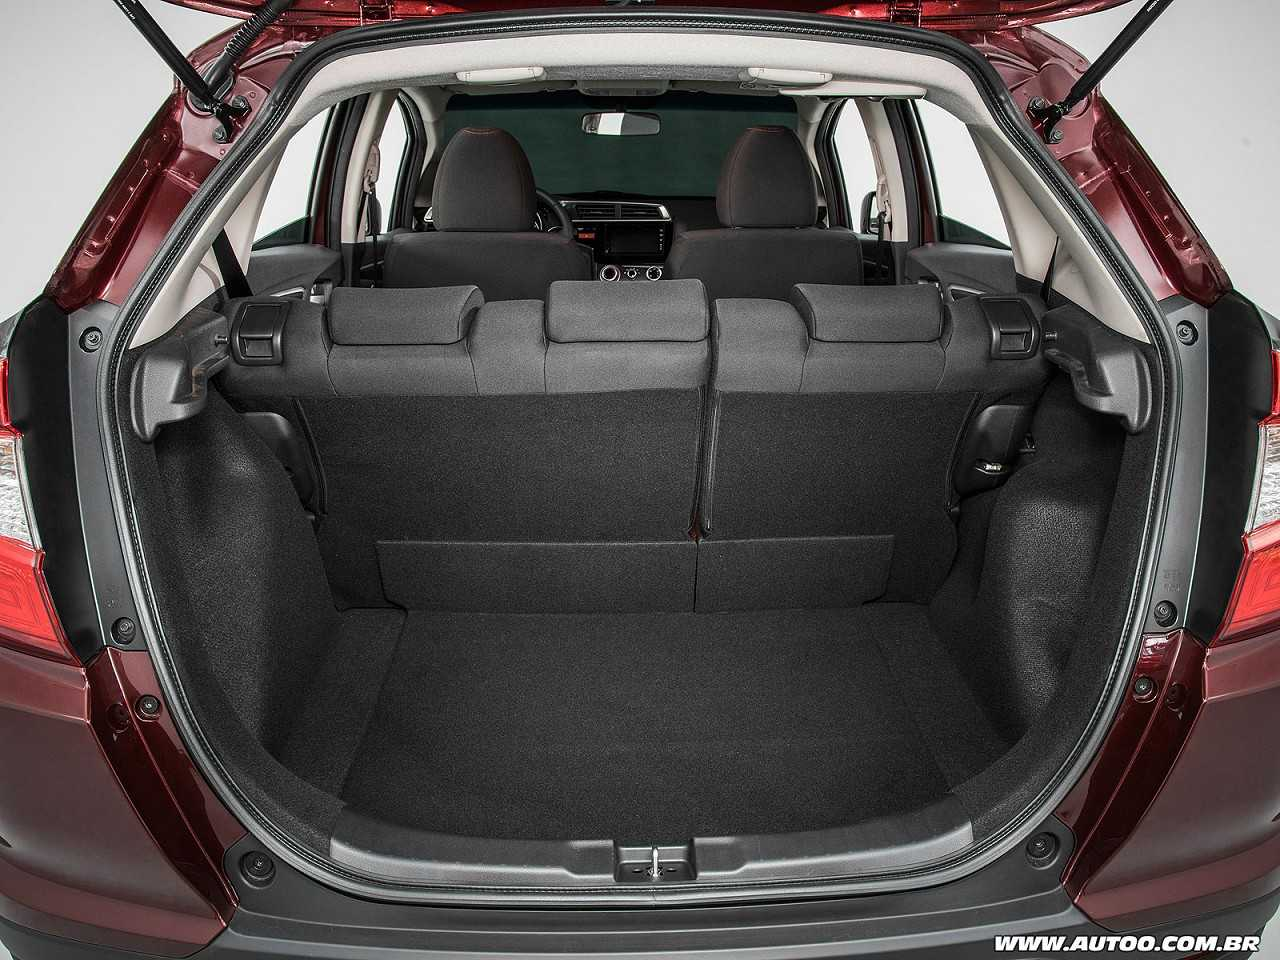 HondaWR-V 2018 - porta-malas